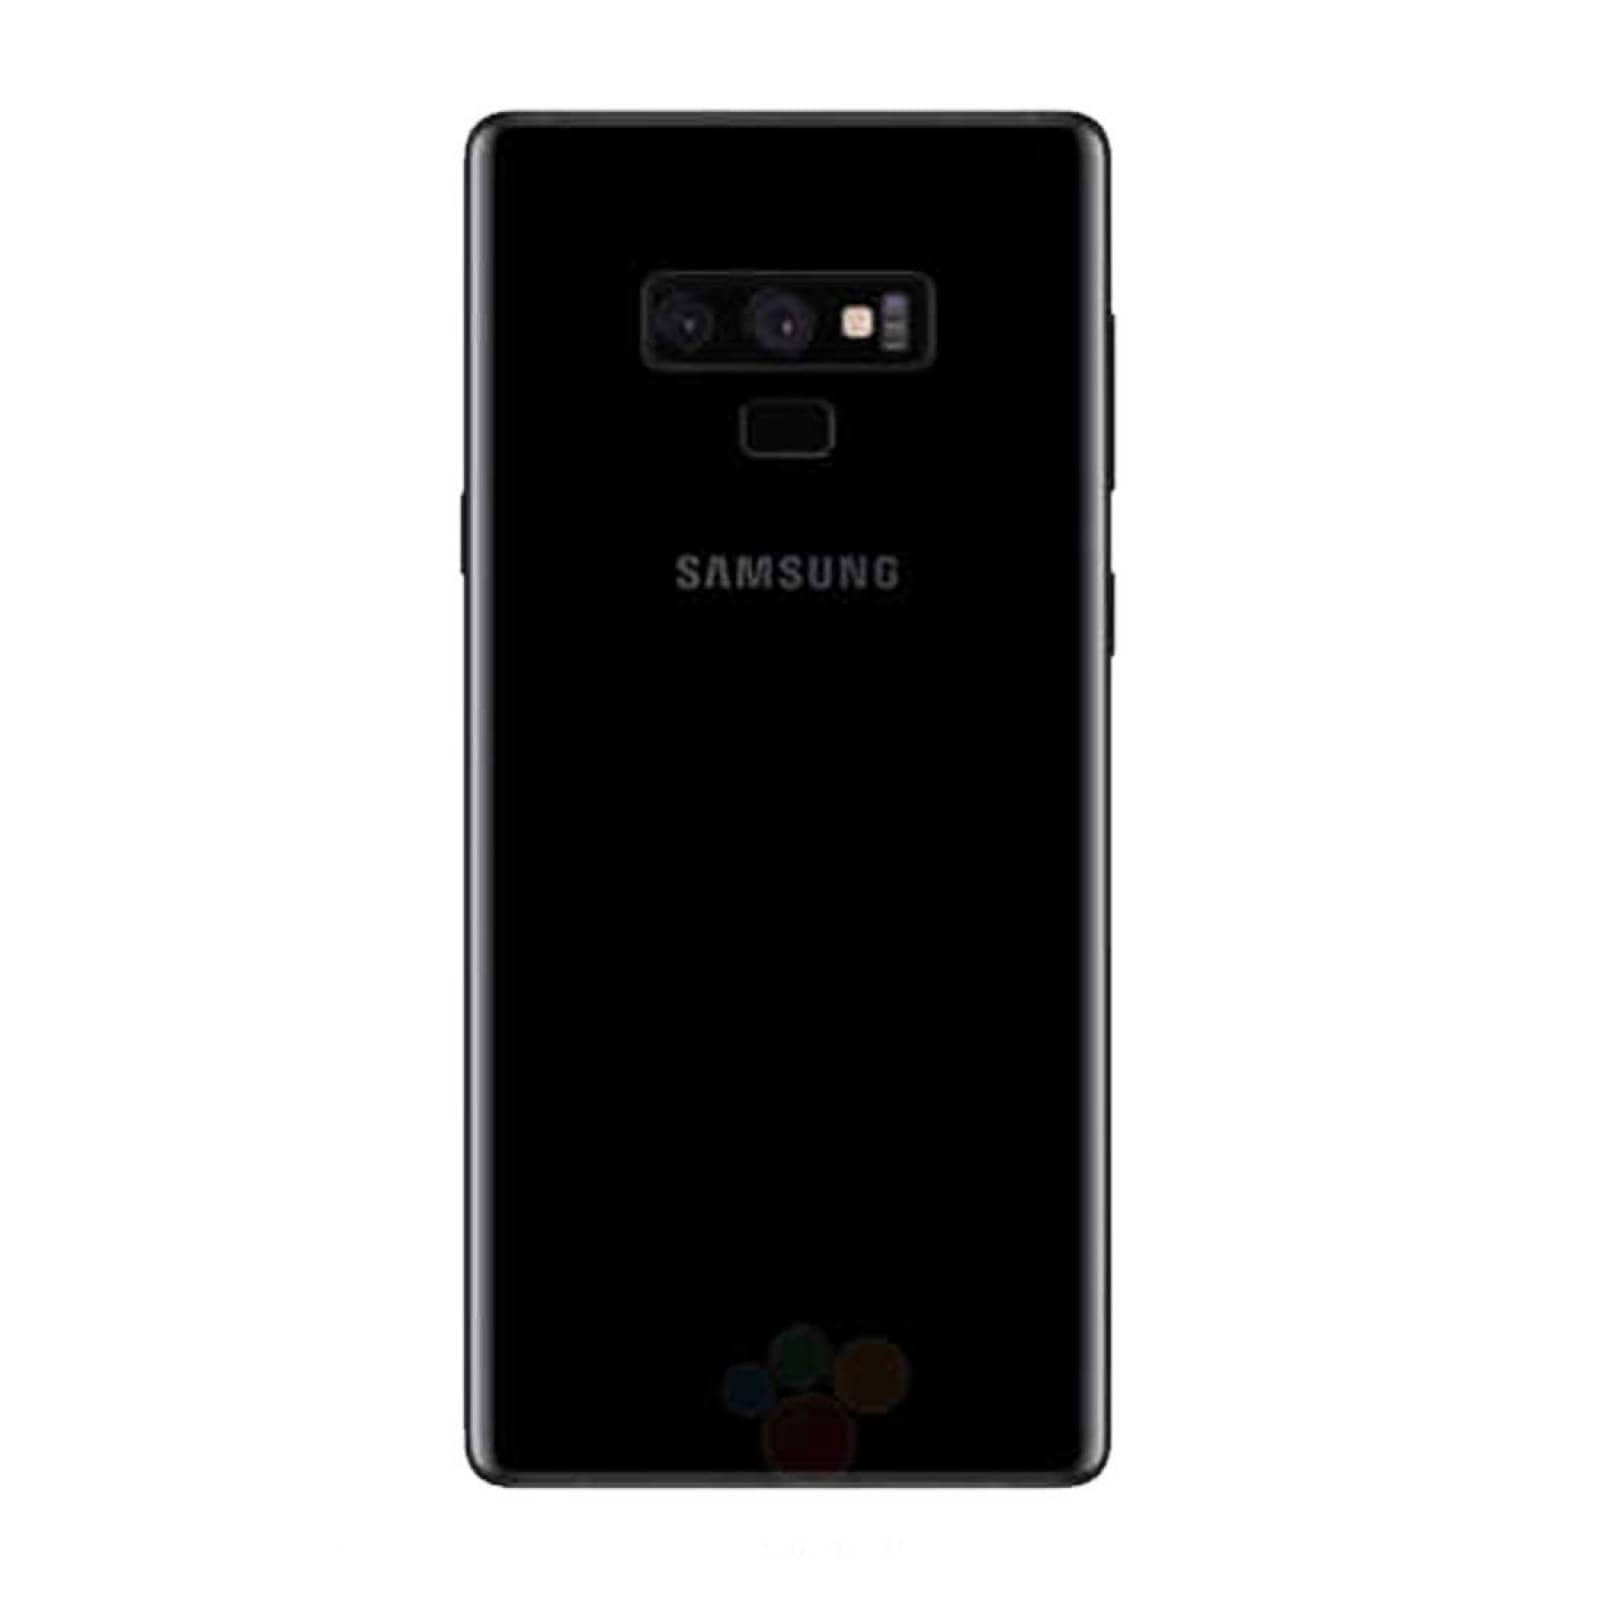 Celular Smartphone Samsung Galaxy Note 9 Duos SM-N9600 NEGRO